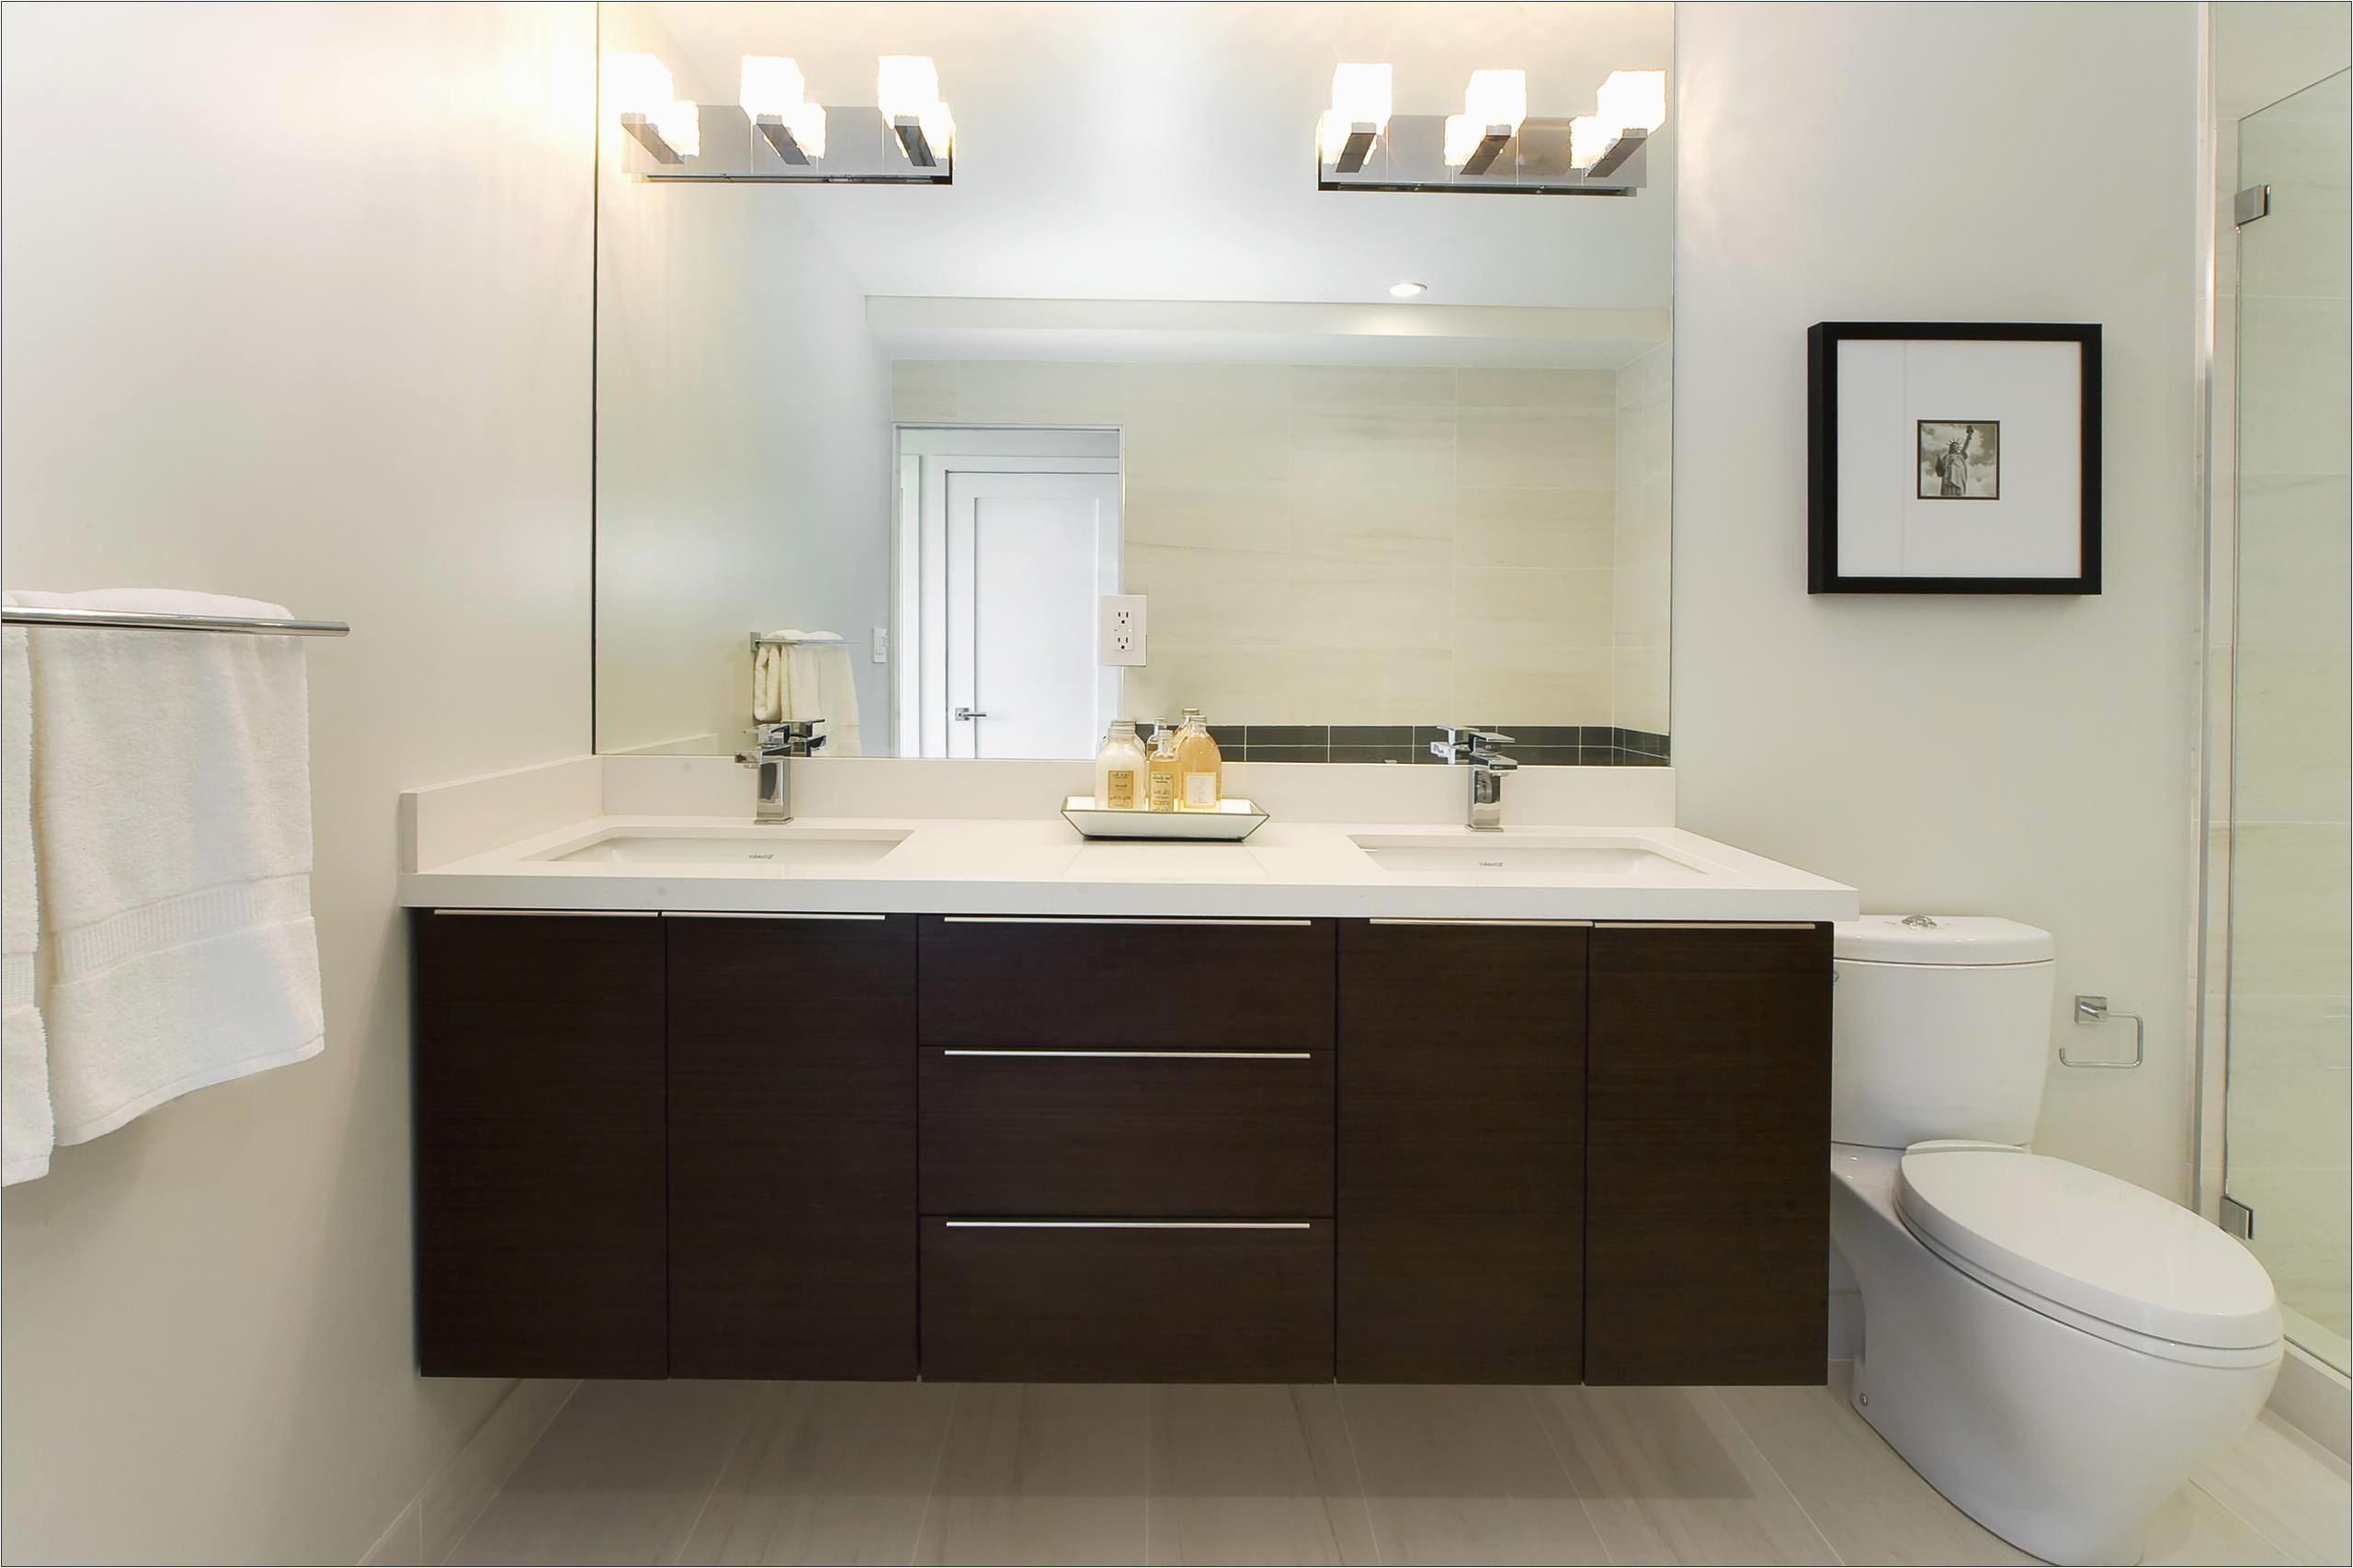 bathroom costco bathroom spectacular furniture awesome costco sinks elegant 18 best classic bathroom costco